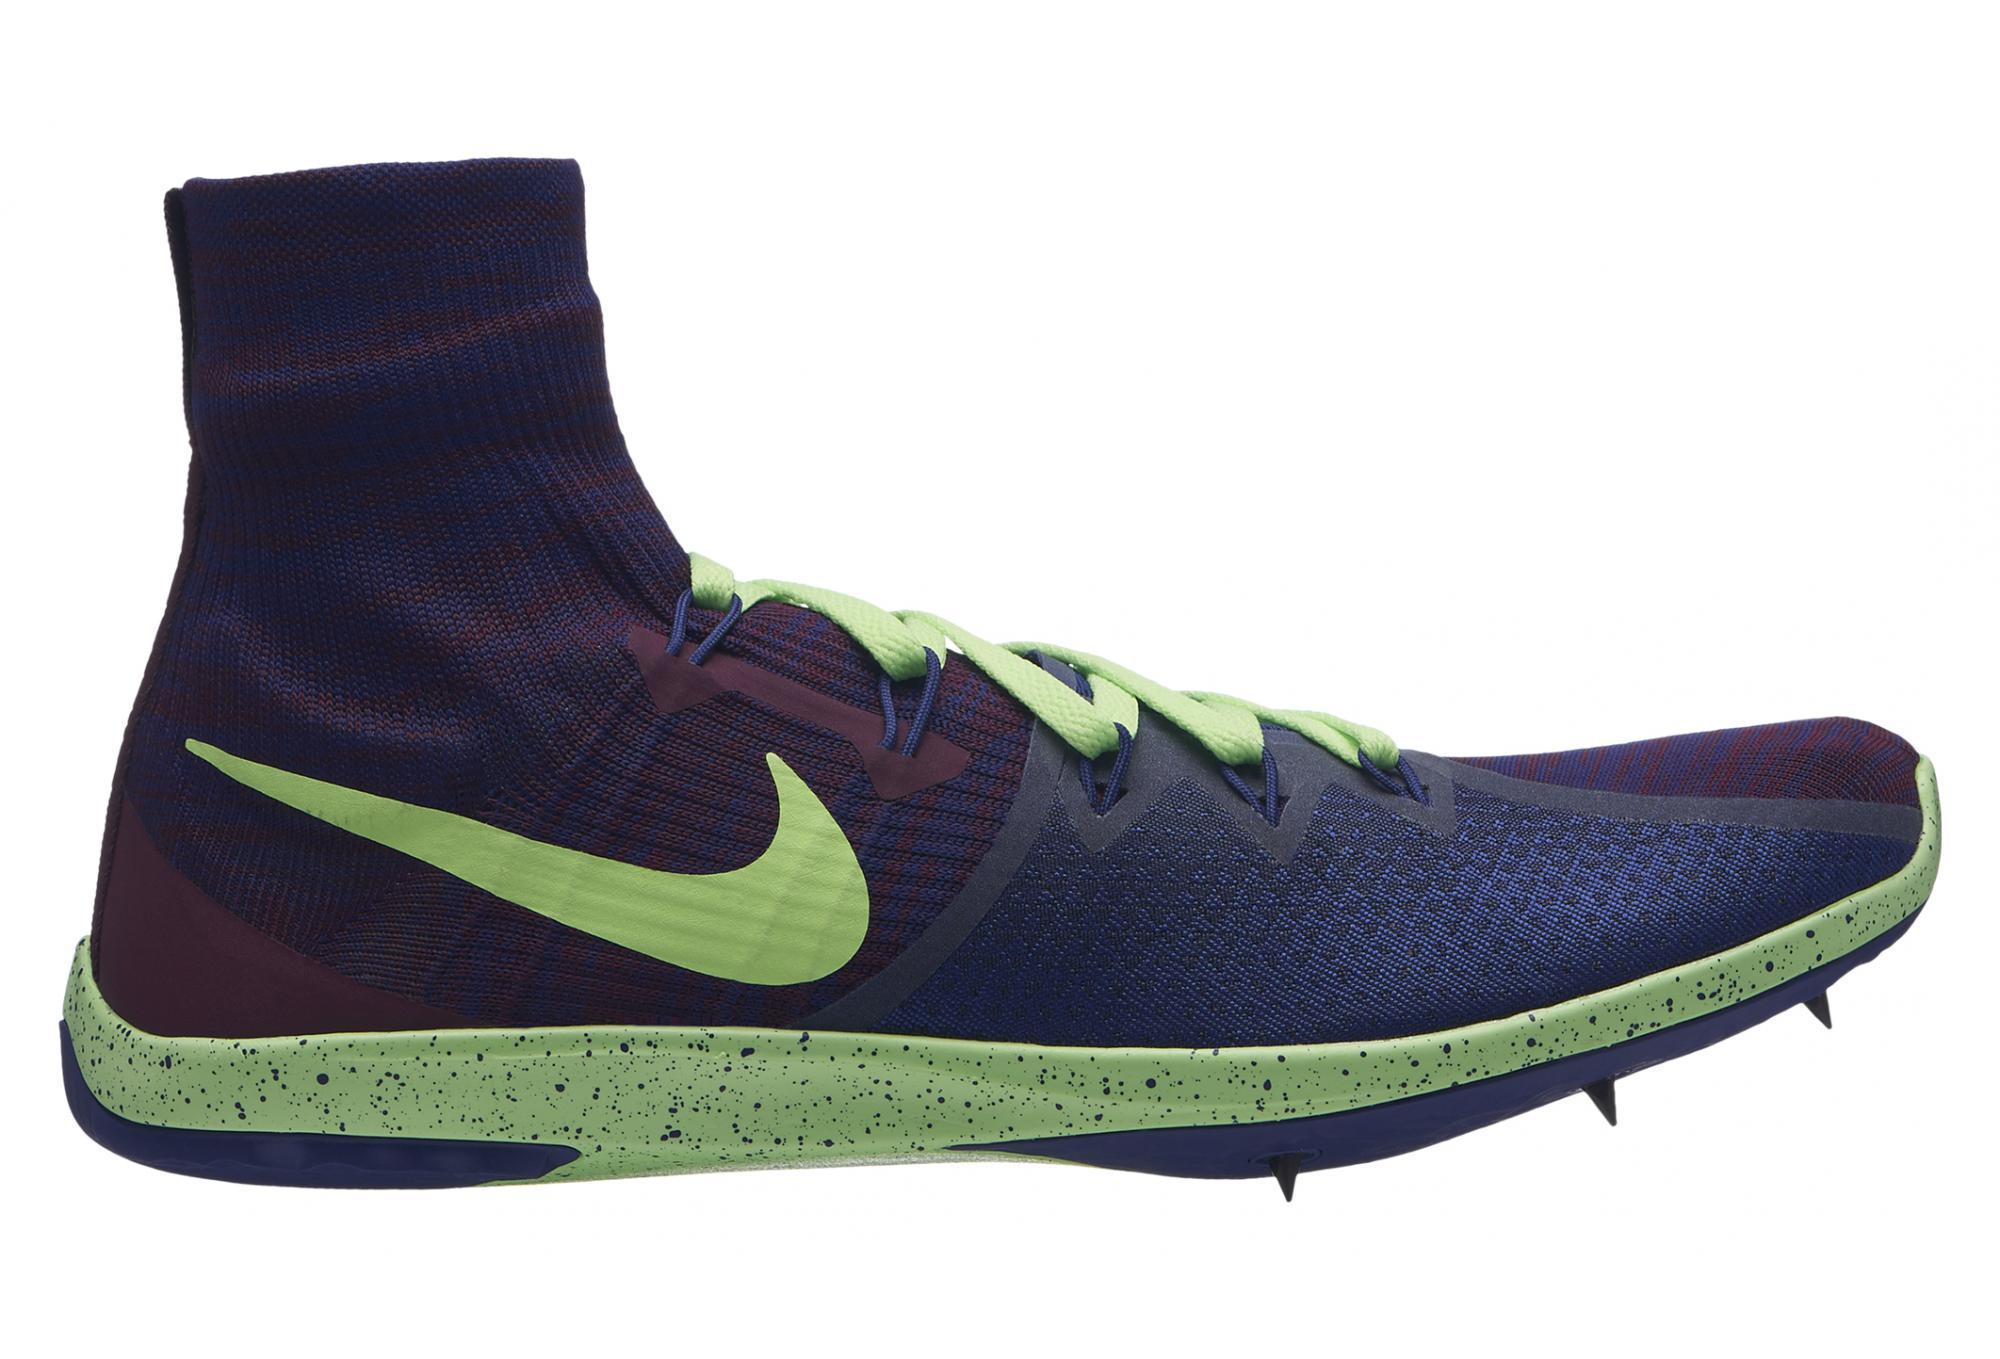 Victory Bleu Zoom Xc Vert Nike Bordeau 4 LUMSGzpqV